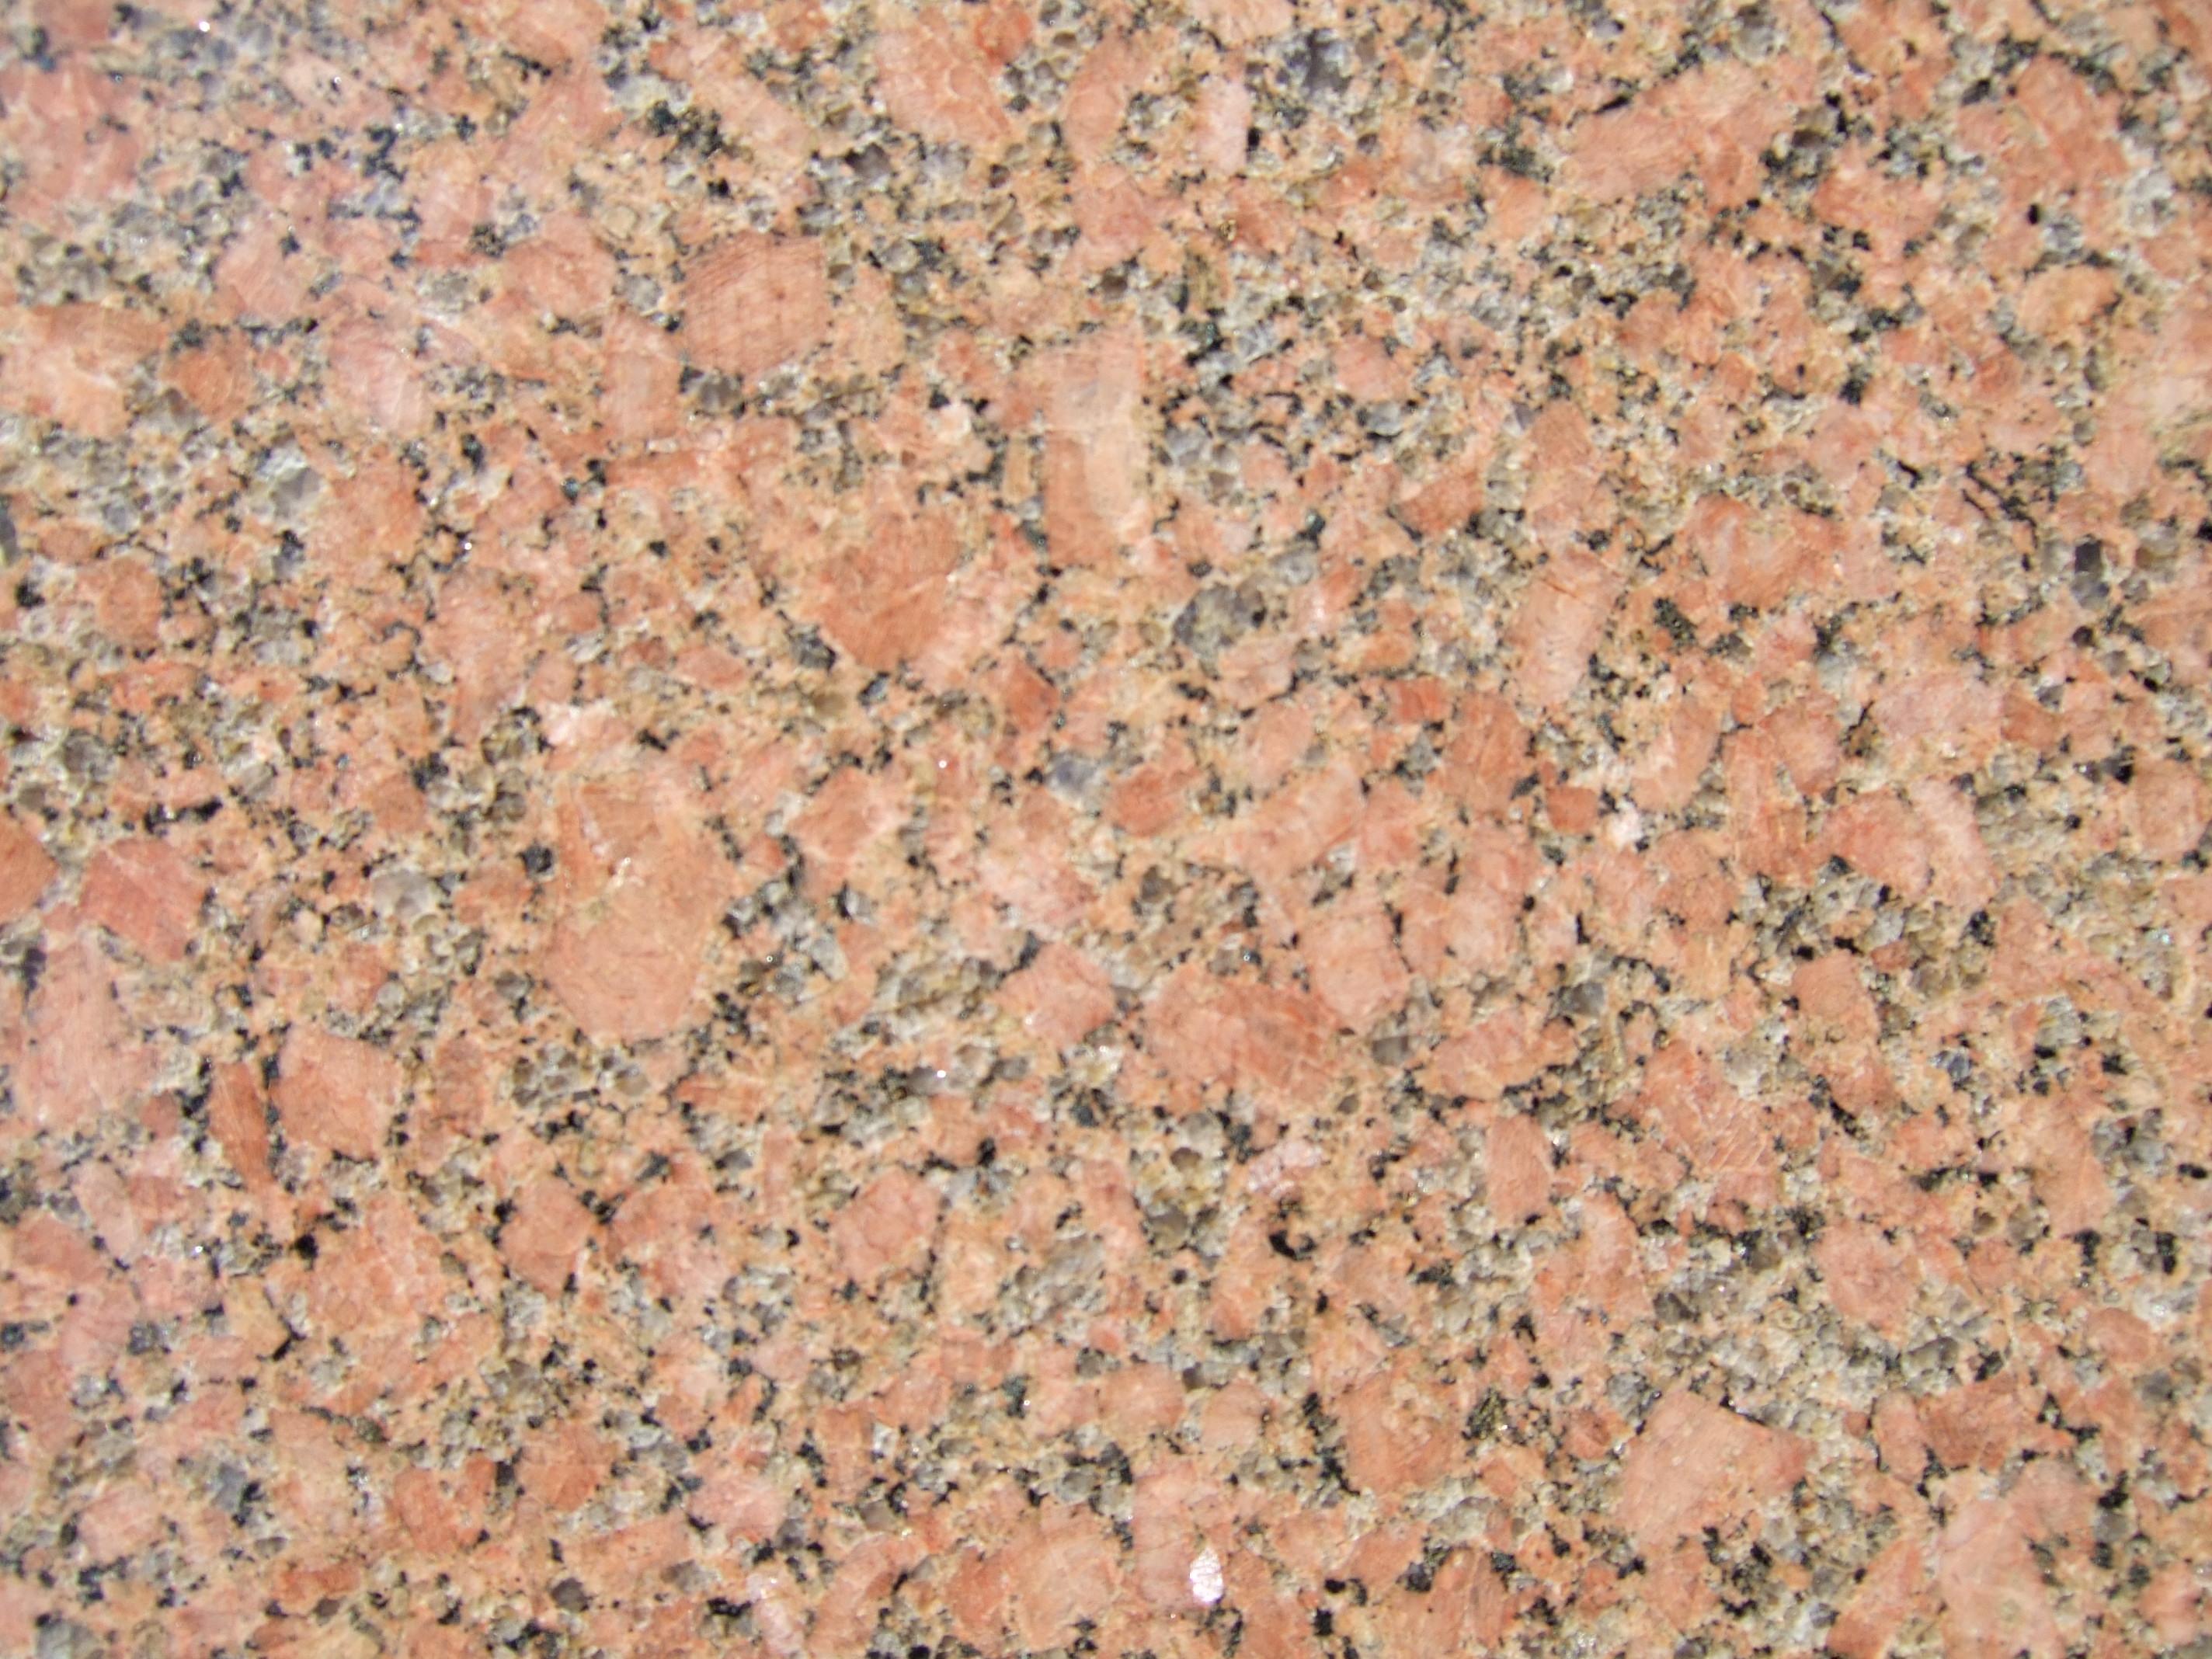 Types Of Granite : S type granite